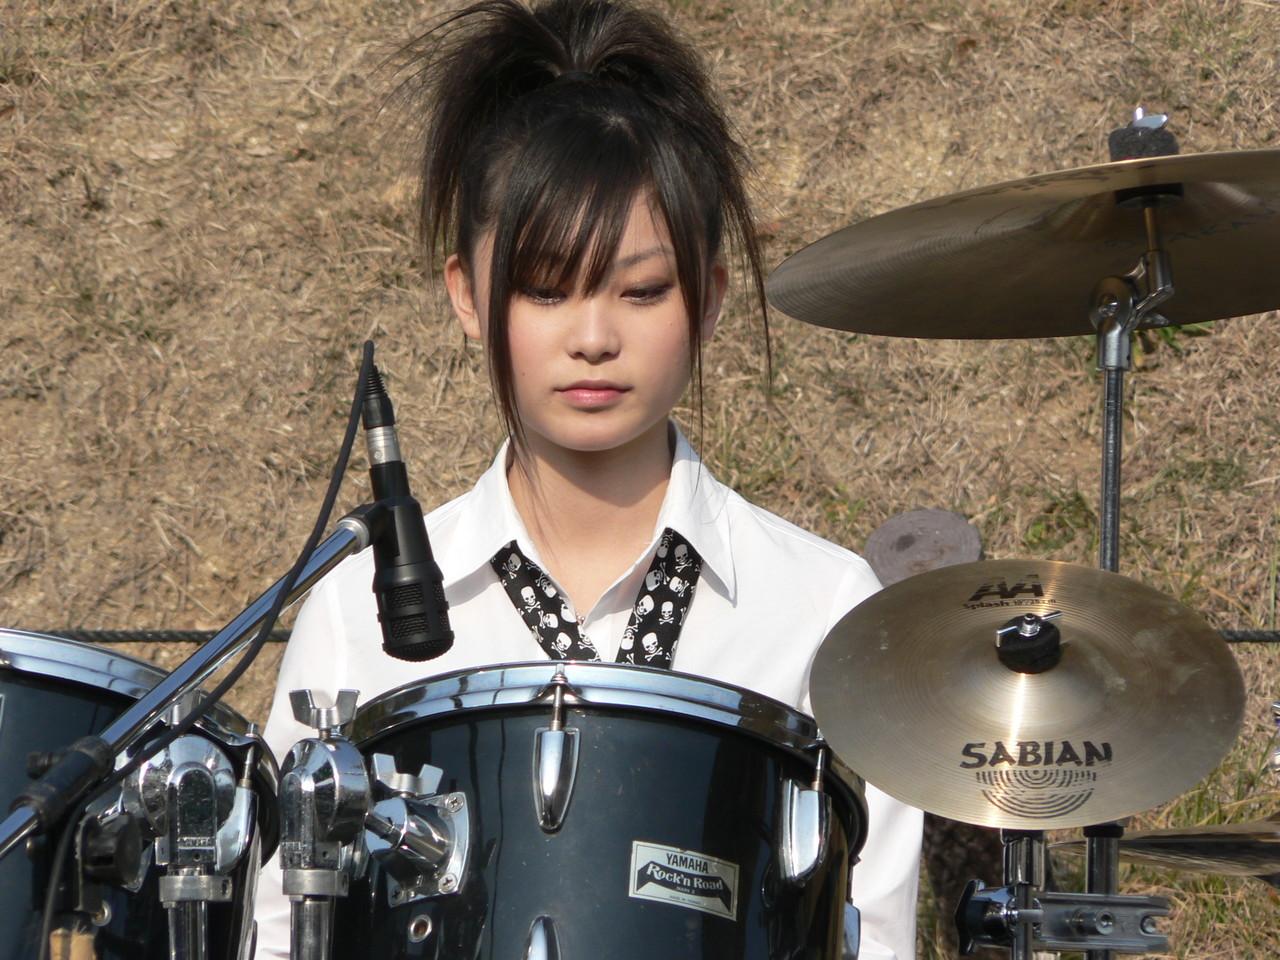 http://1.bp.blogspot.com/_8ZatmiwiGUk/TOwOV4WZpDI/AAAAAAAAACU/mEUU8vWZpsk/s1600/Rina+Suzuki+2.jpg